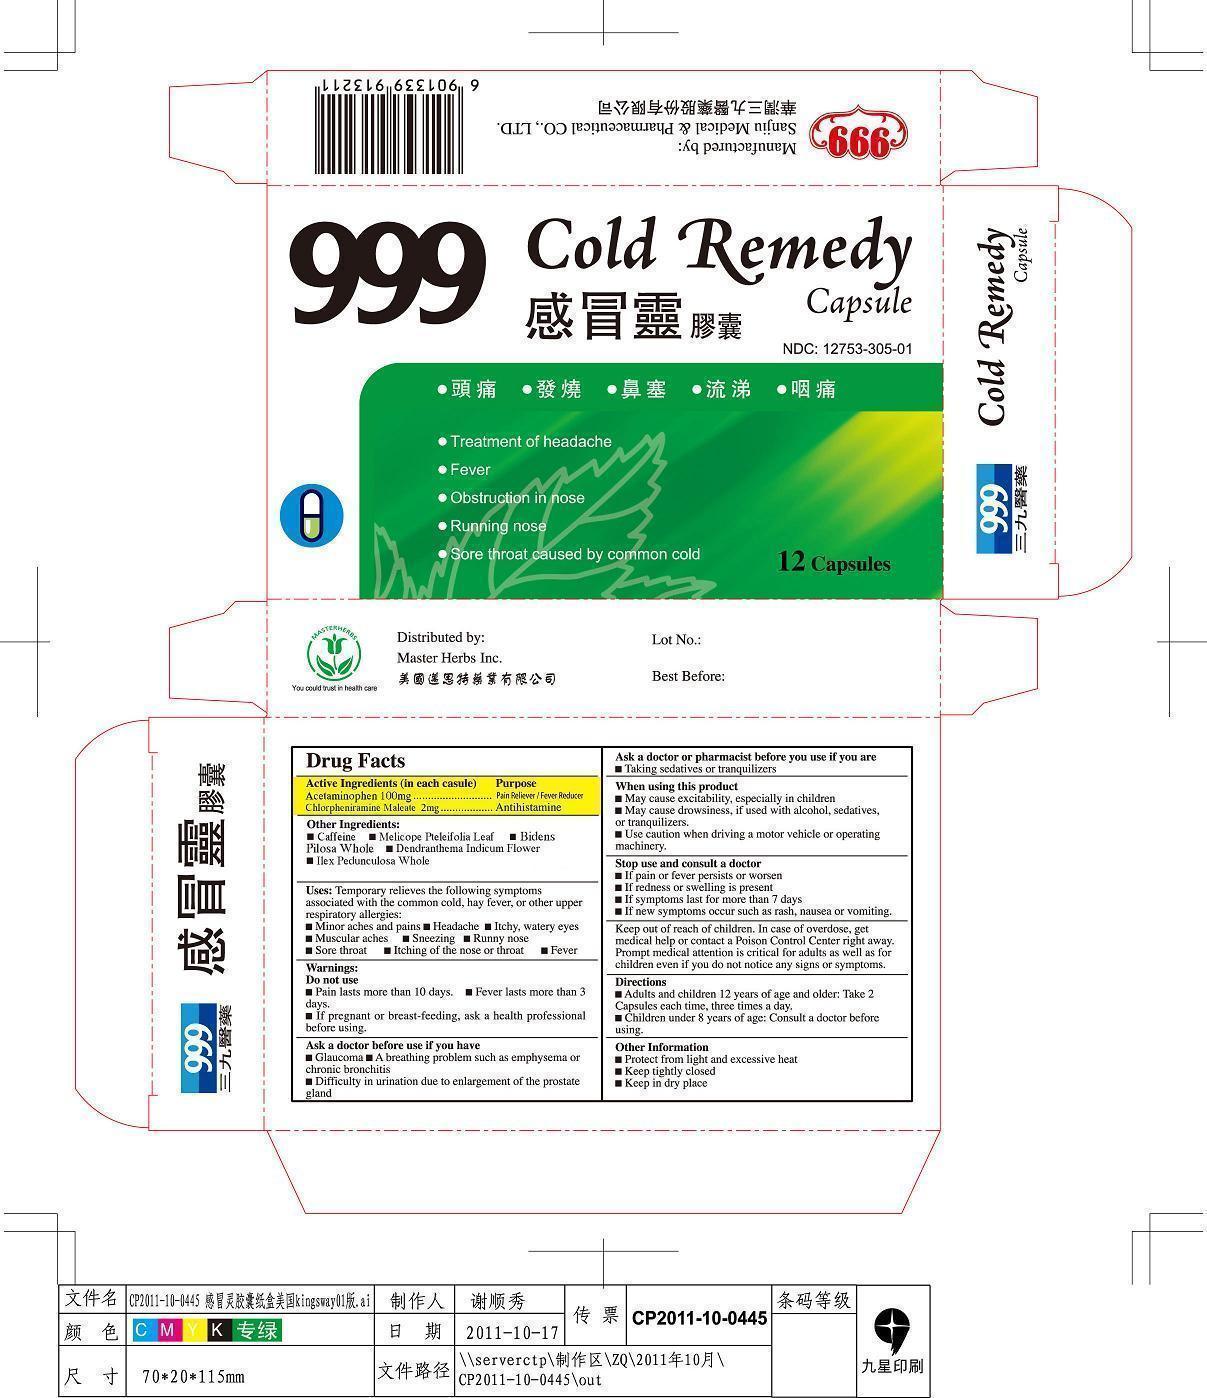 999 Cold Remedy (Acetaminophen, Chlorpheniramine Maleate, Caffeine) Capsule [China Resources Sanjiu Medical & Pharmaceutical Co Ltd]